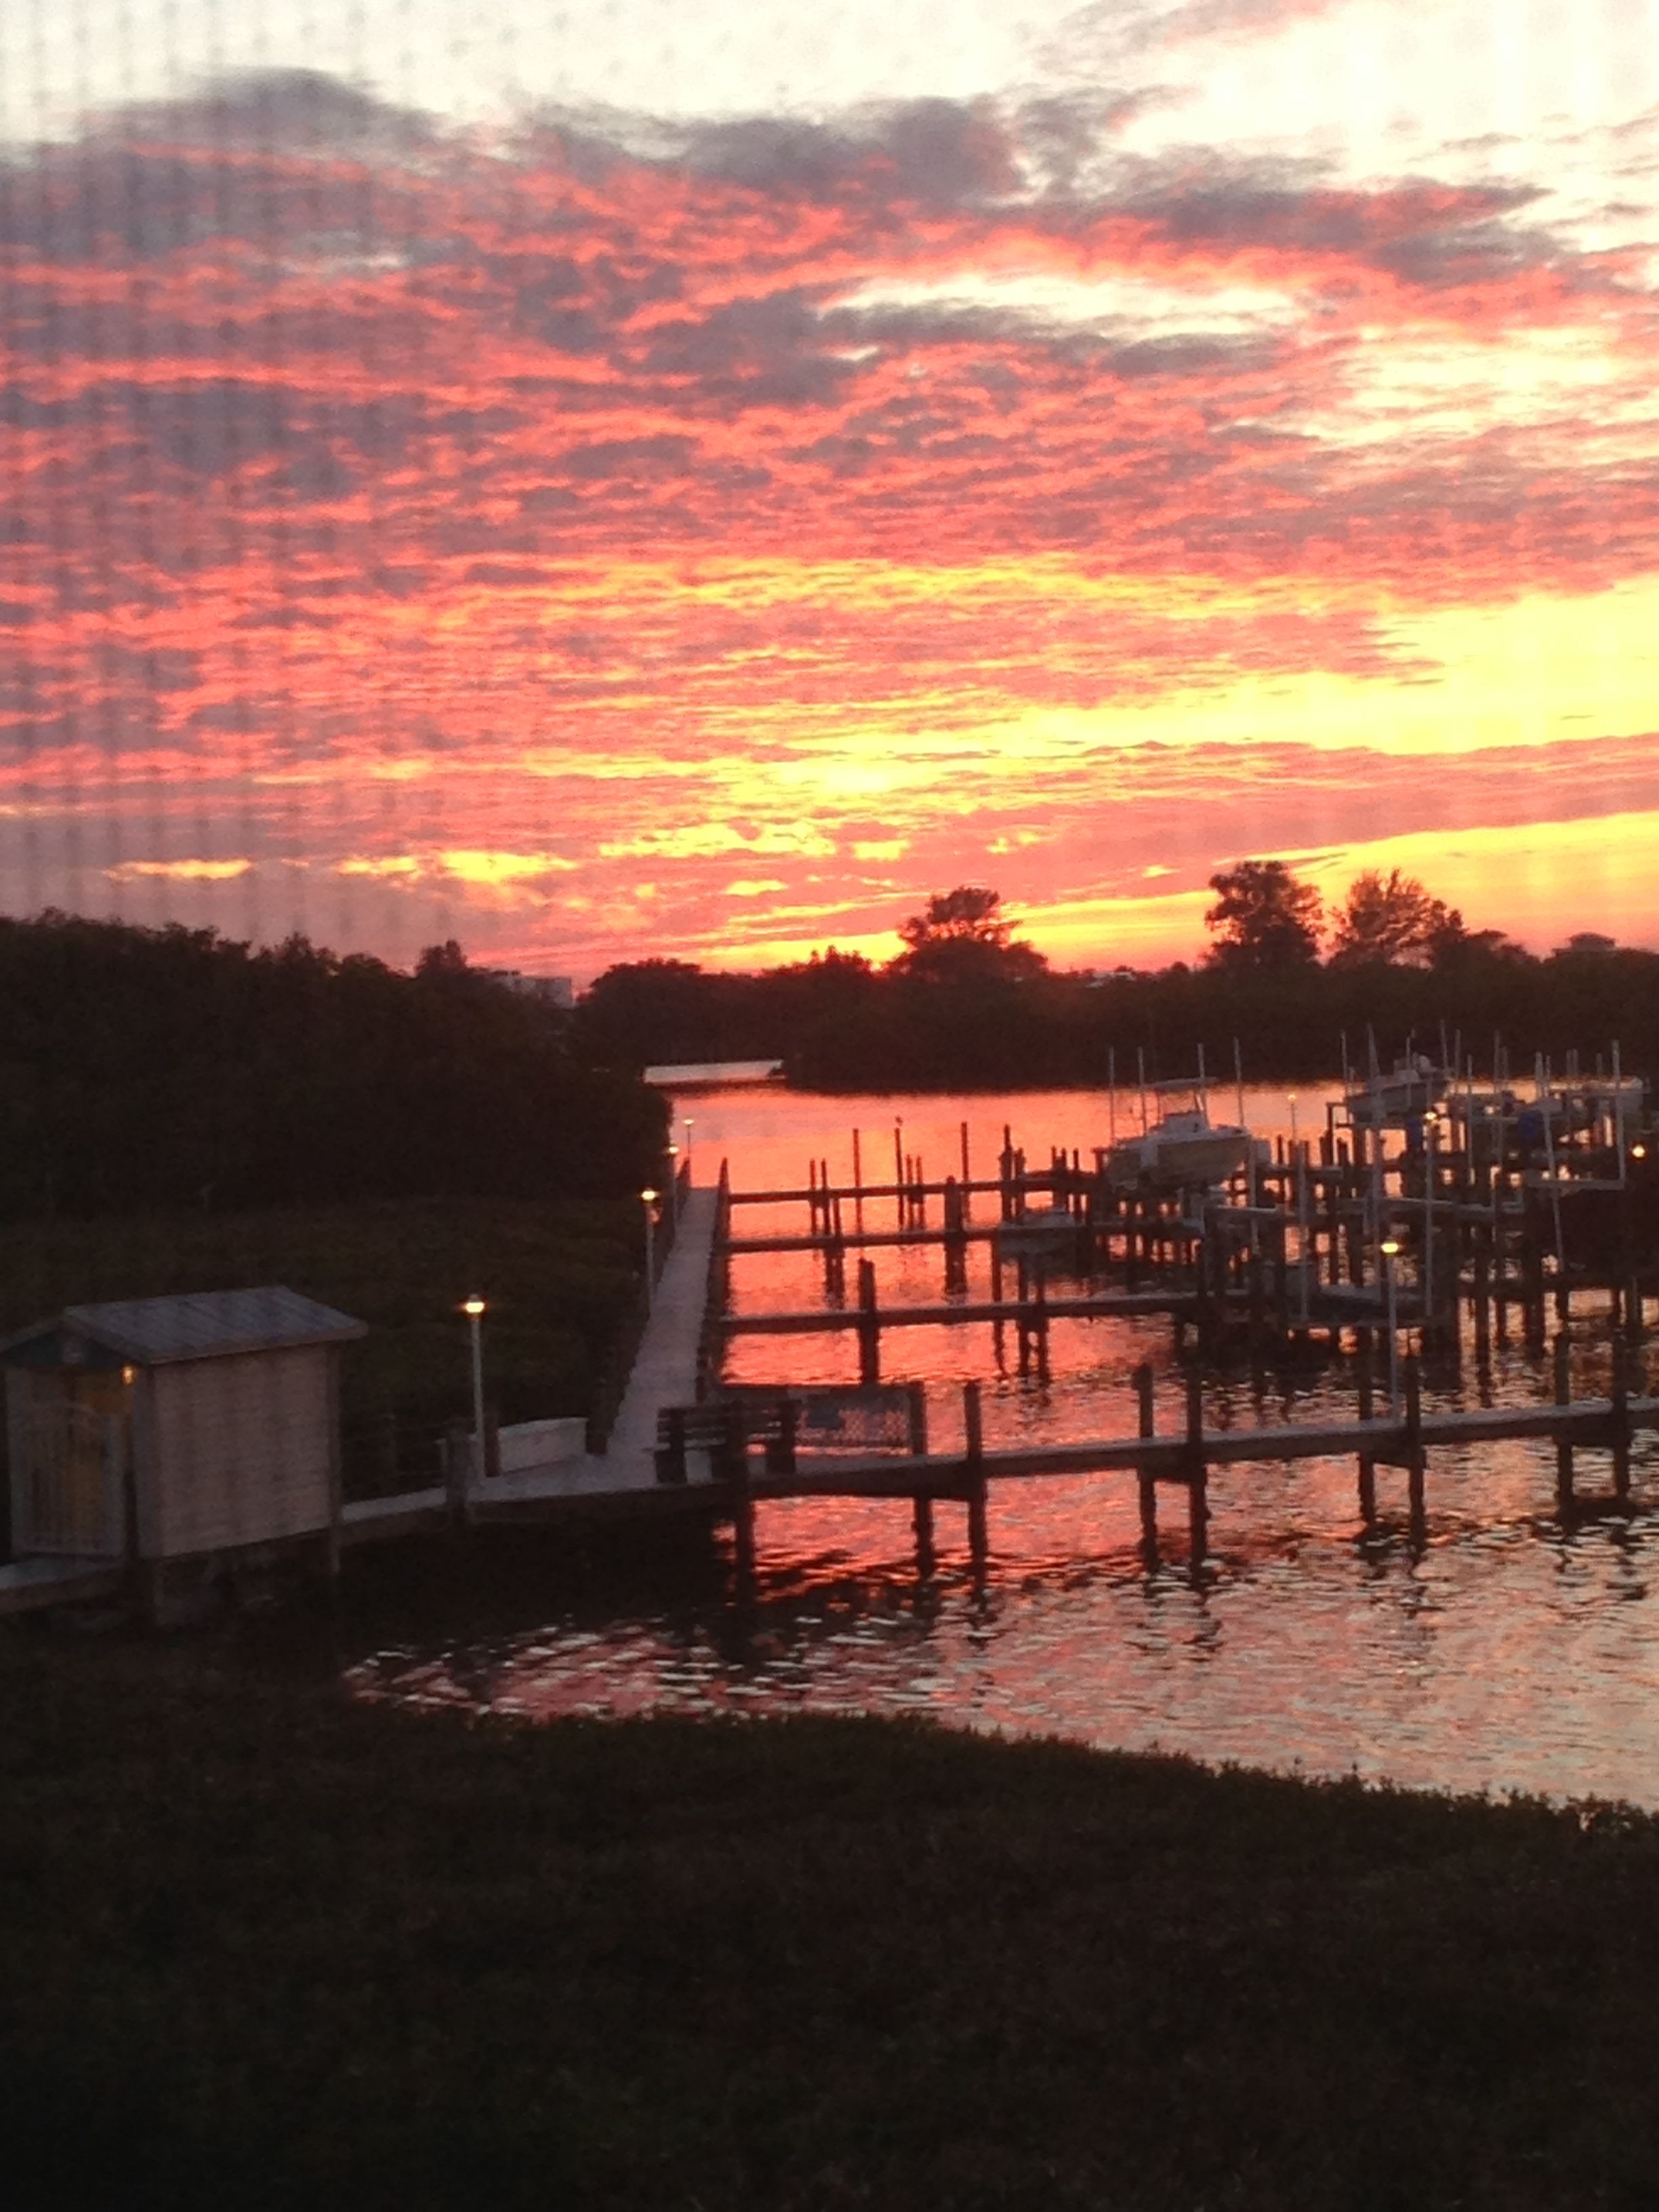 Englewood Florida (With images) | Englewood beach ...